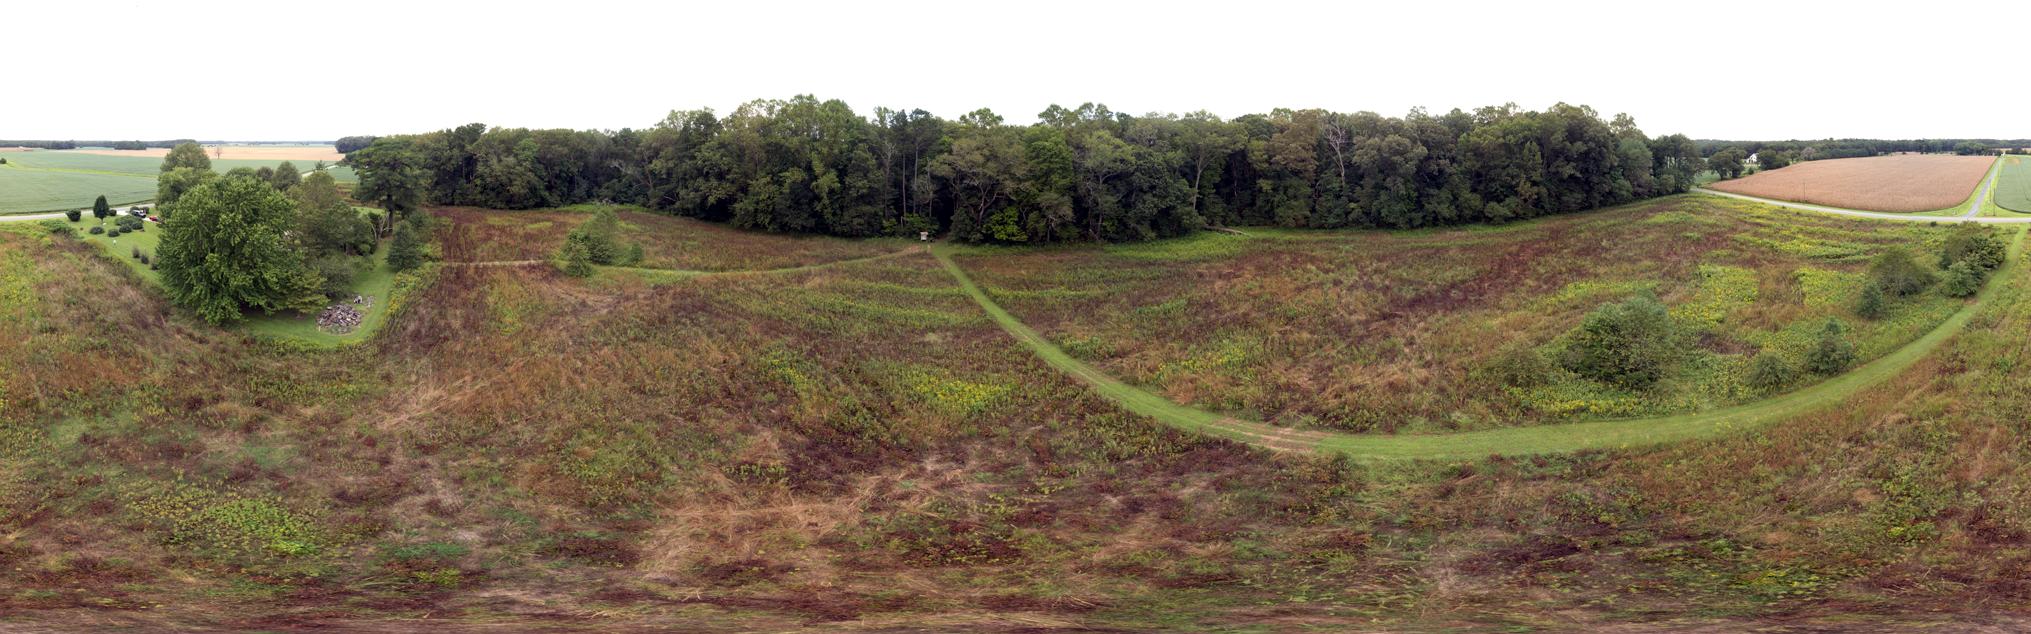 Nassawango Creek Cypress Swamp Preserve, The Nature Conservancy